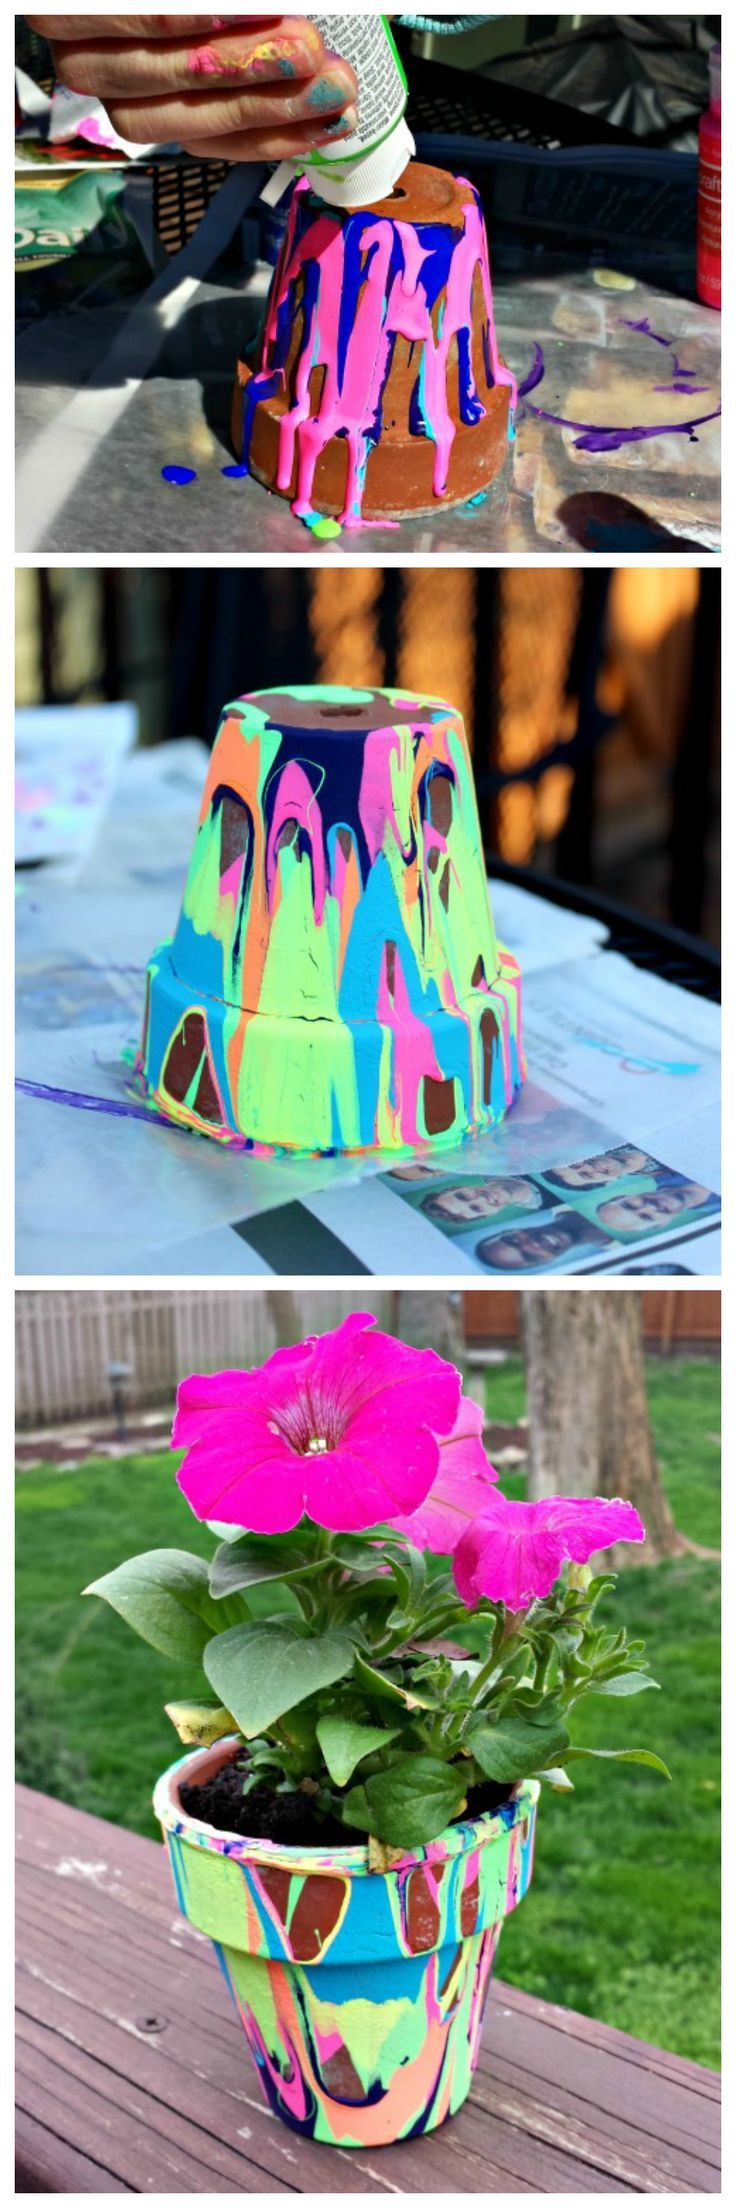 Homemade garden art ideas - Colorful Crafts